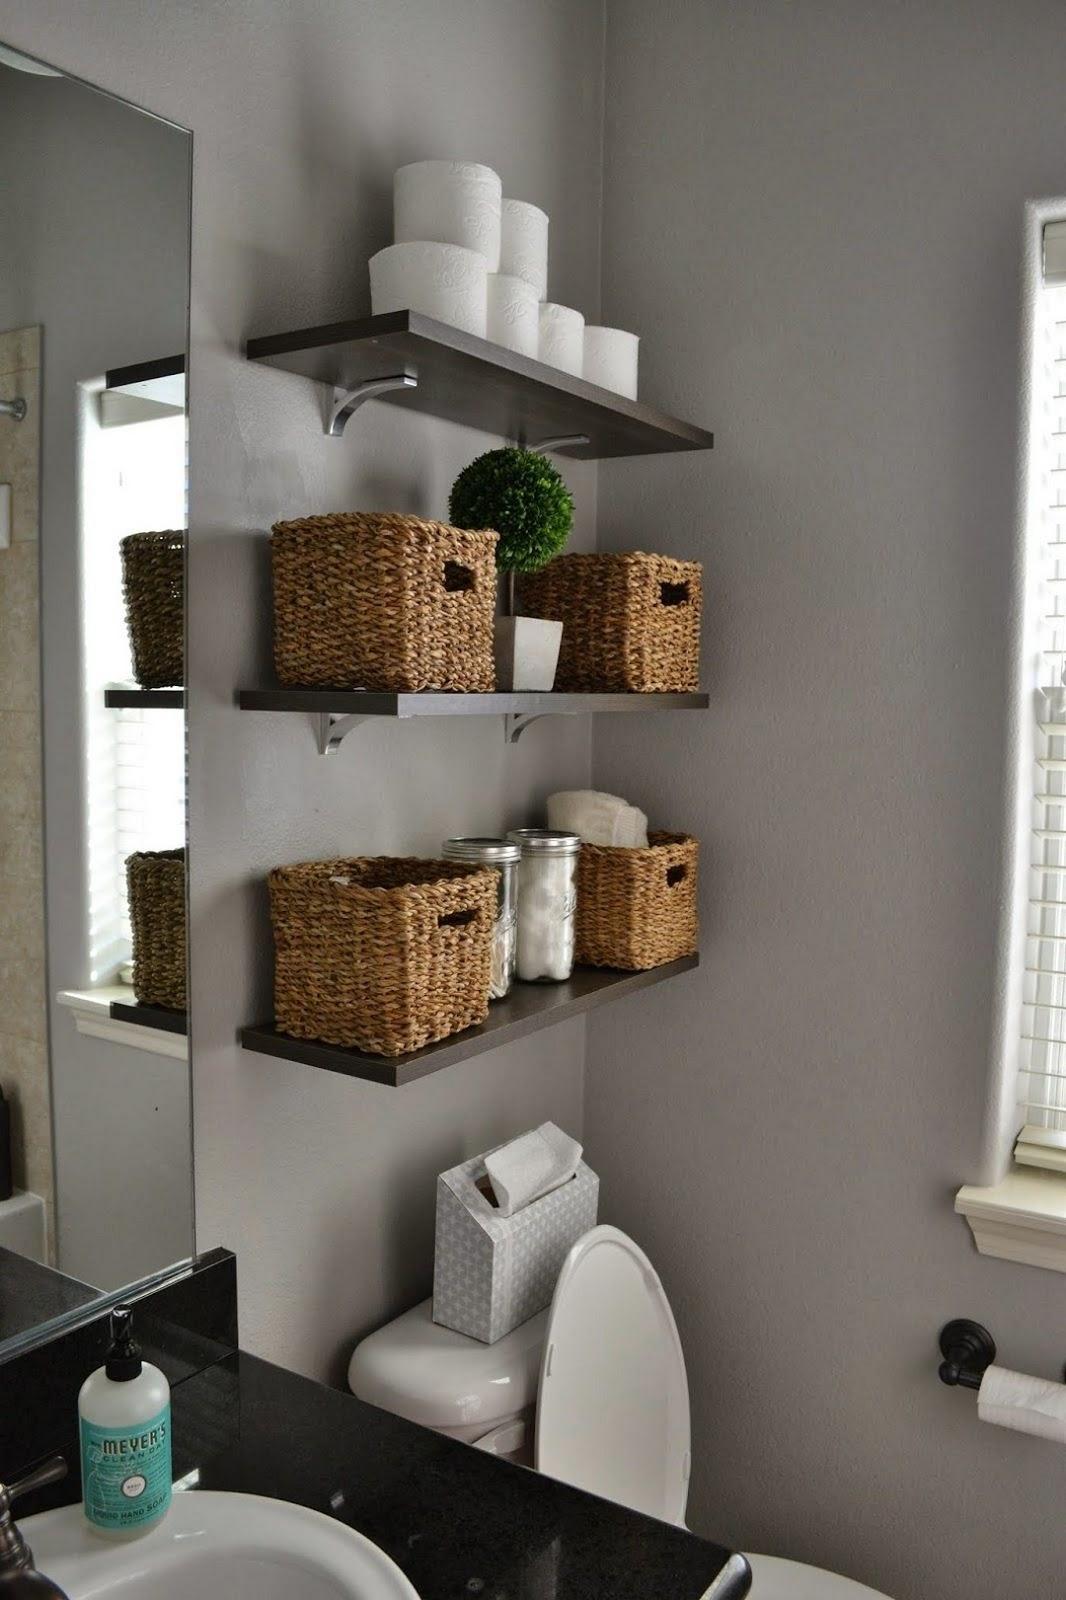 Easy and Effective Small Bathroom Organization Ideas